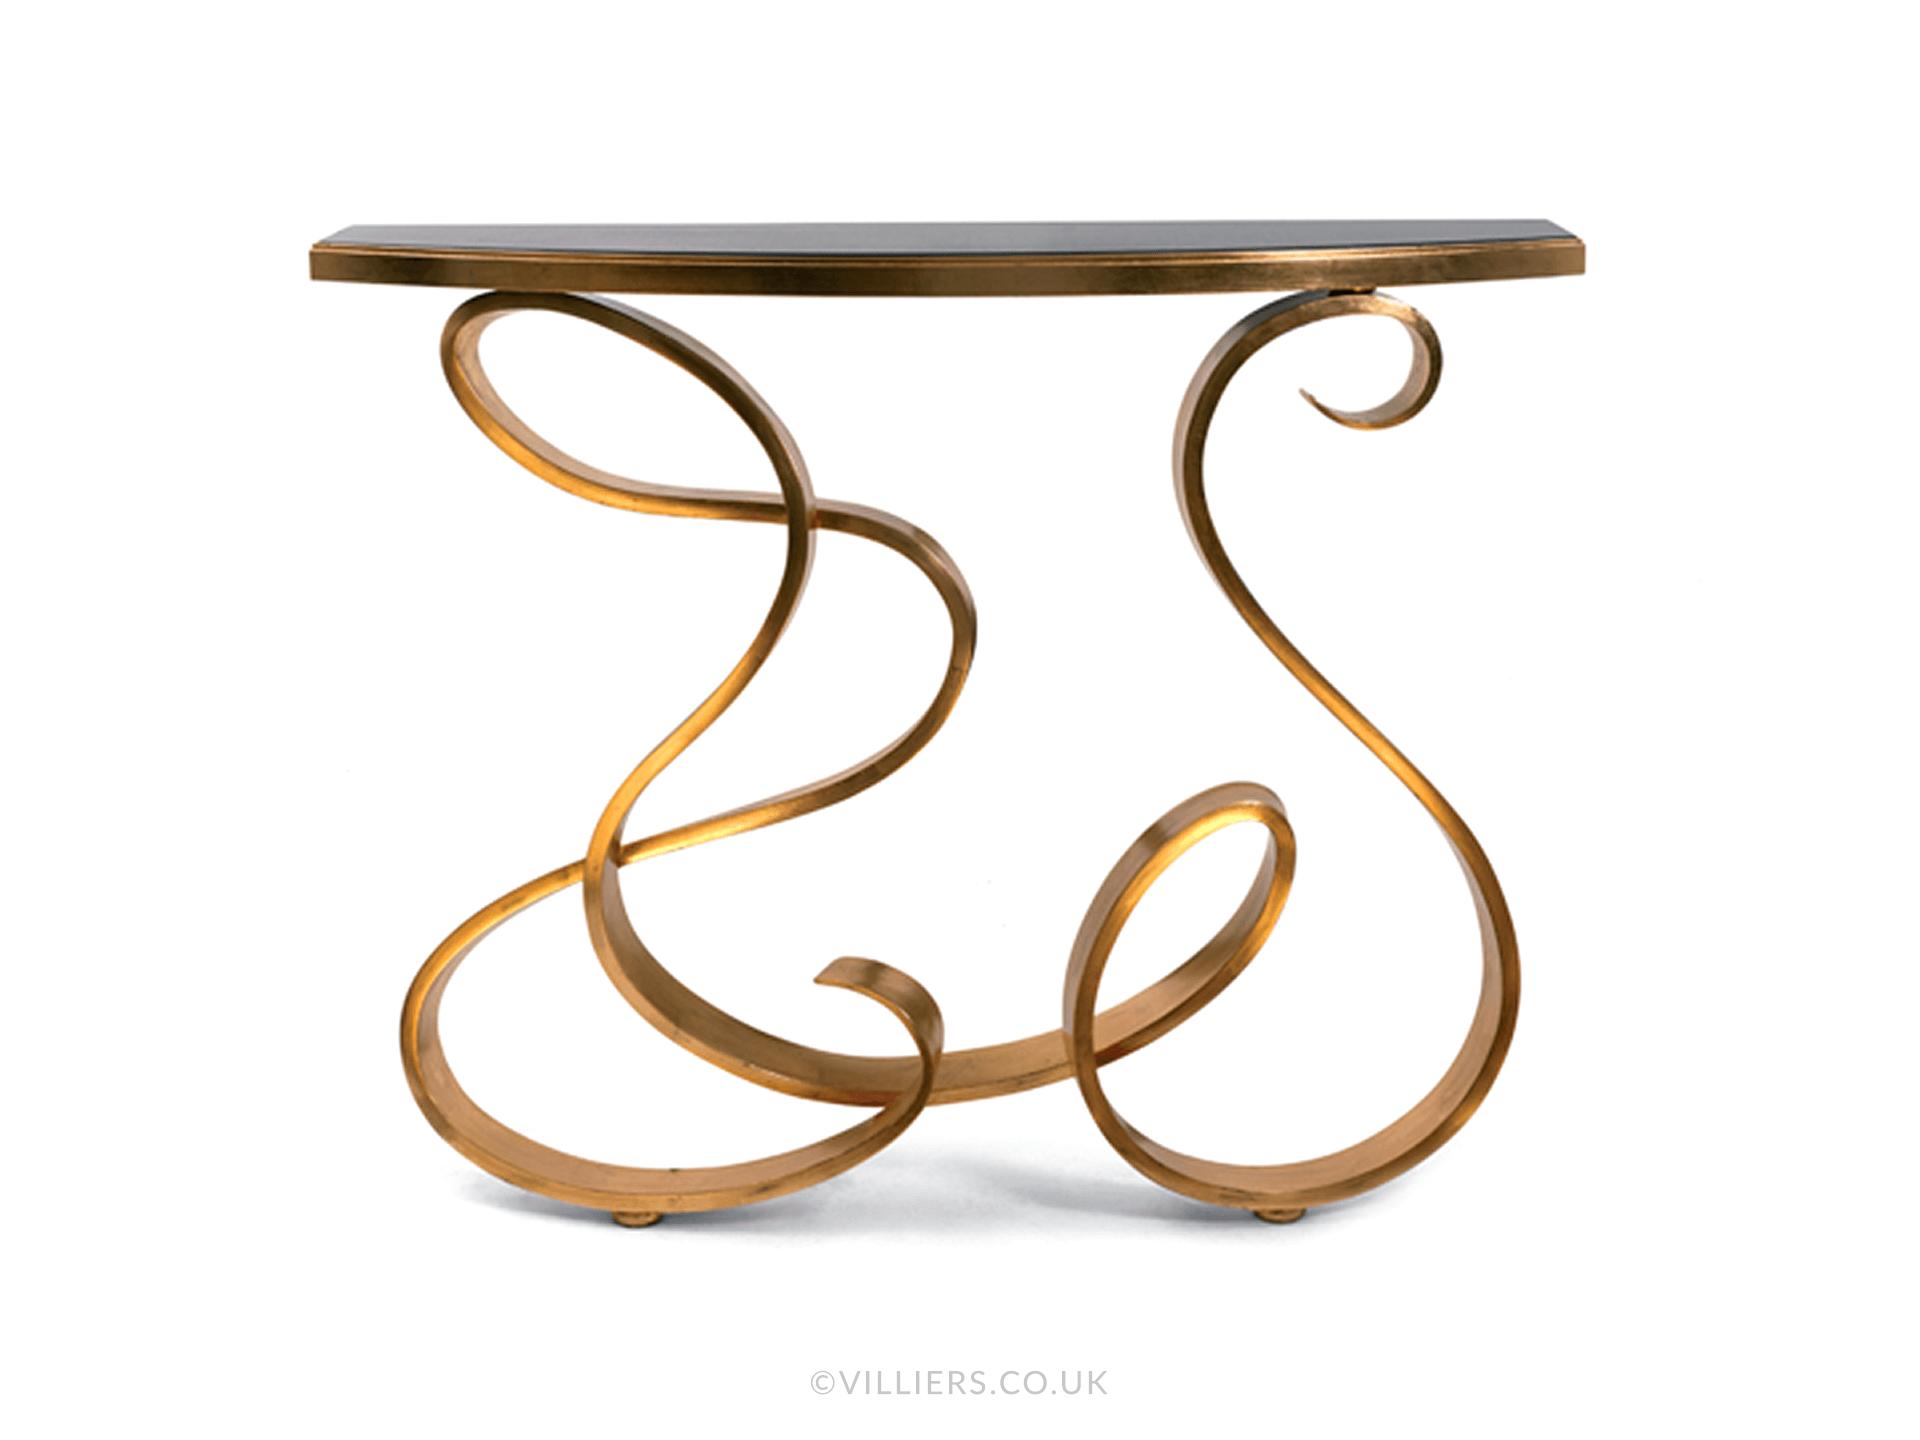 Calypso Console Table - Gold